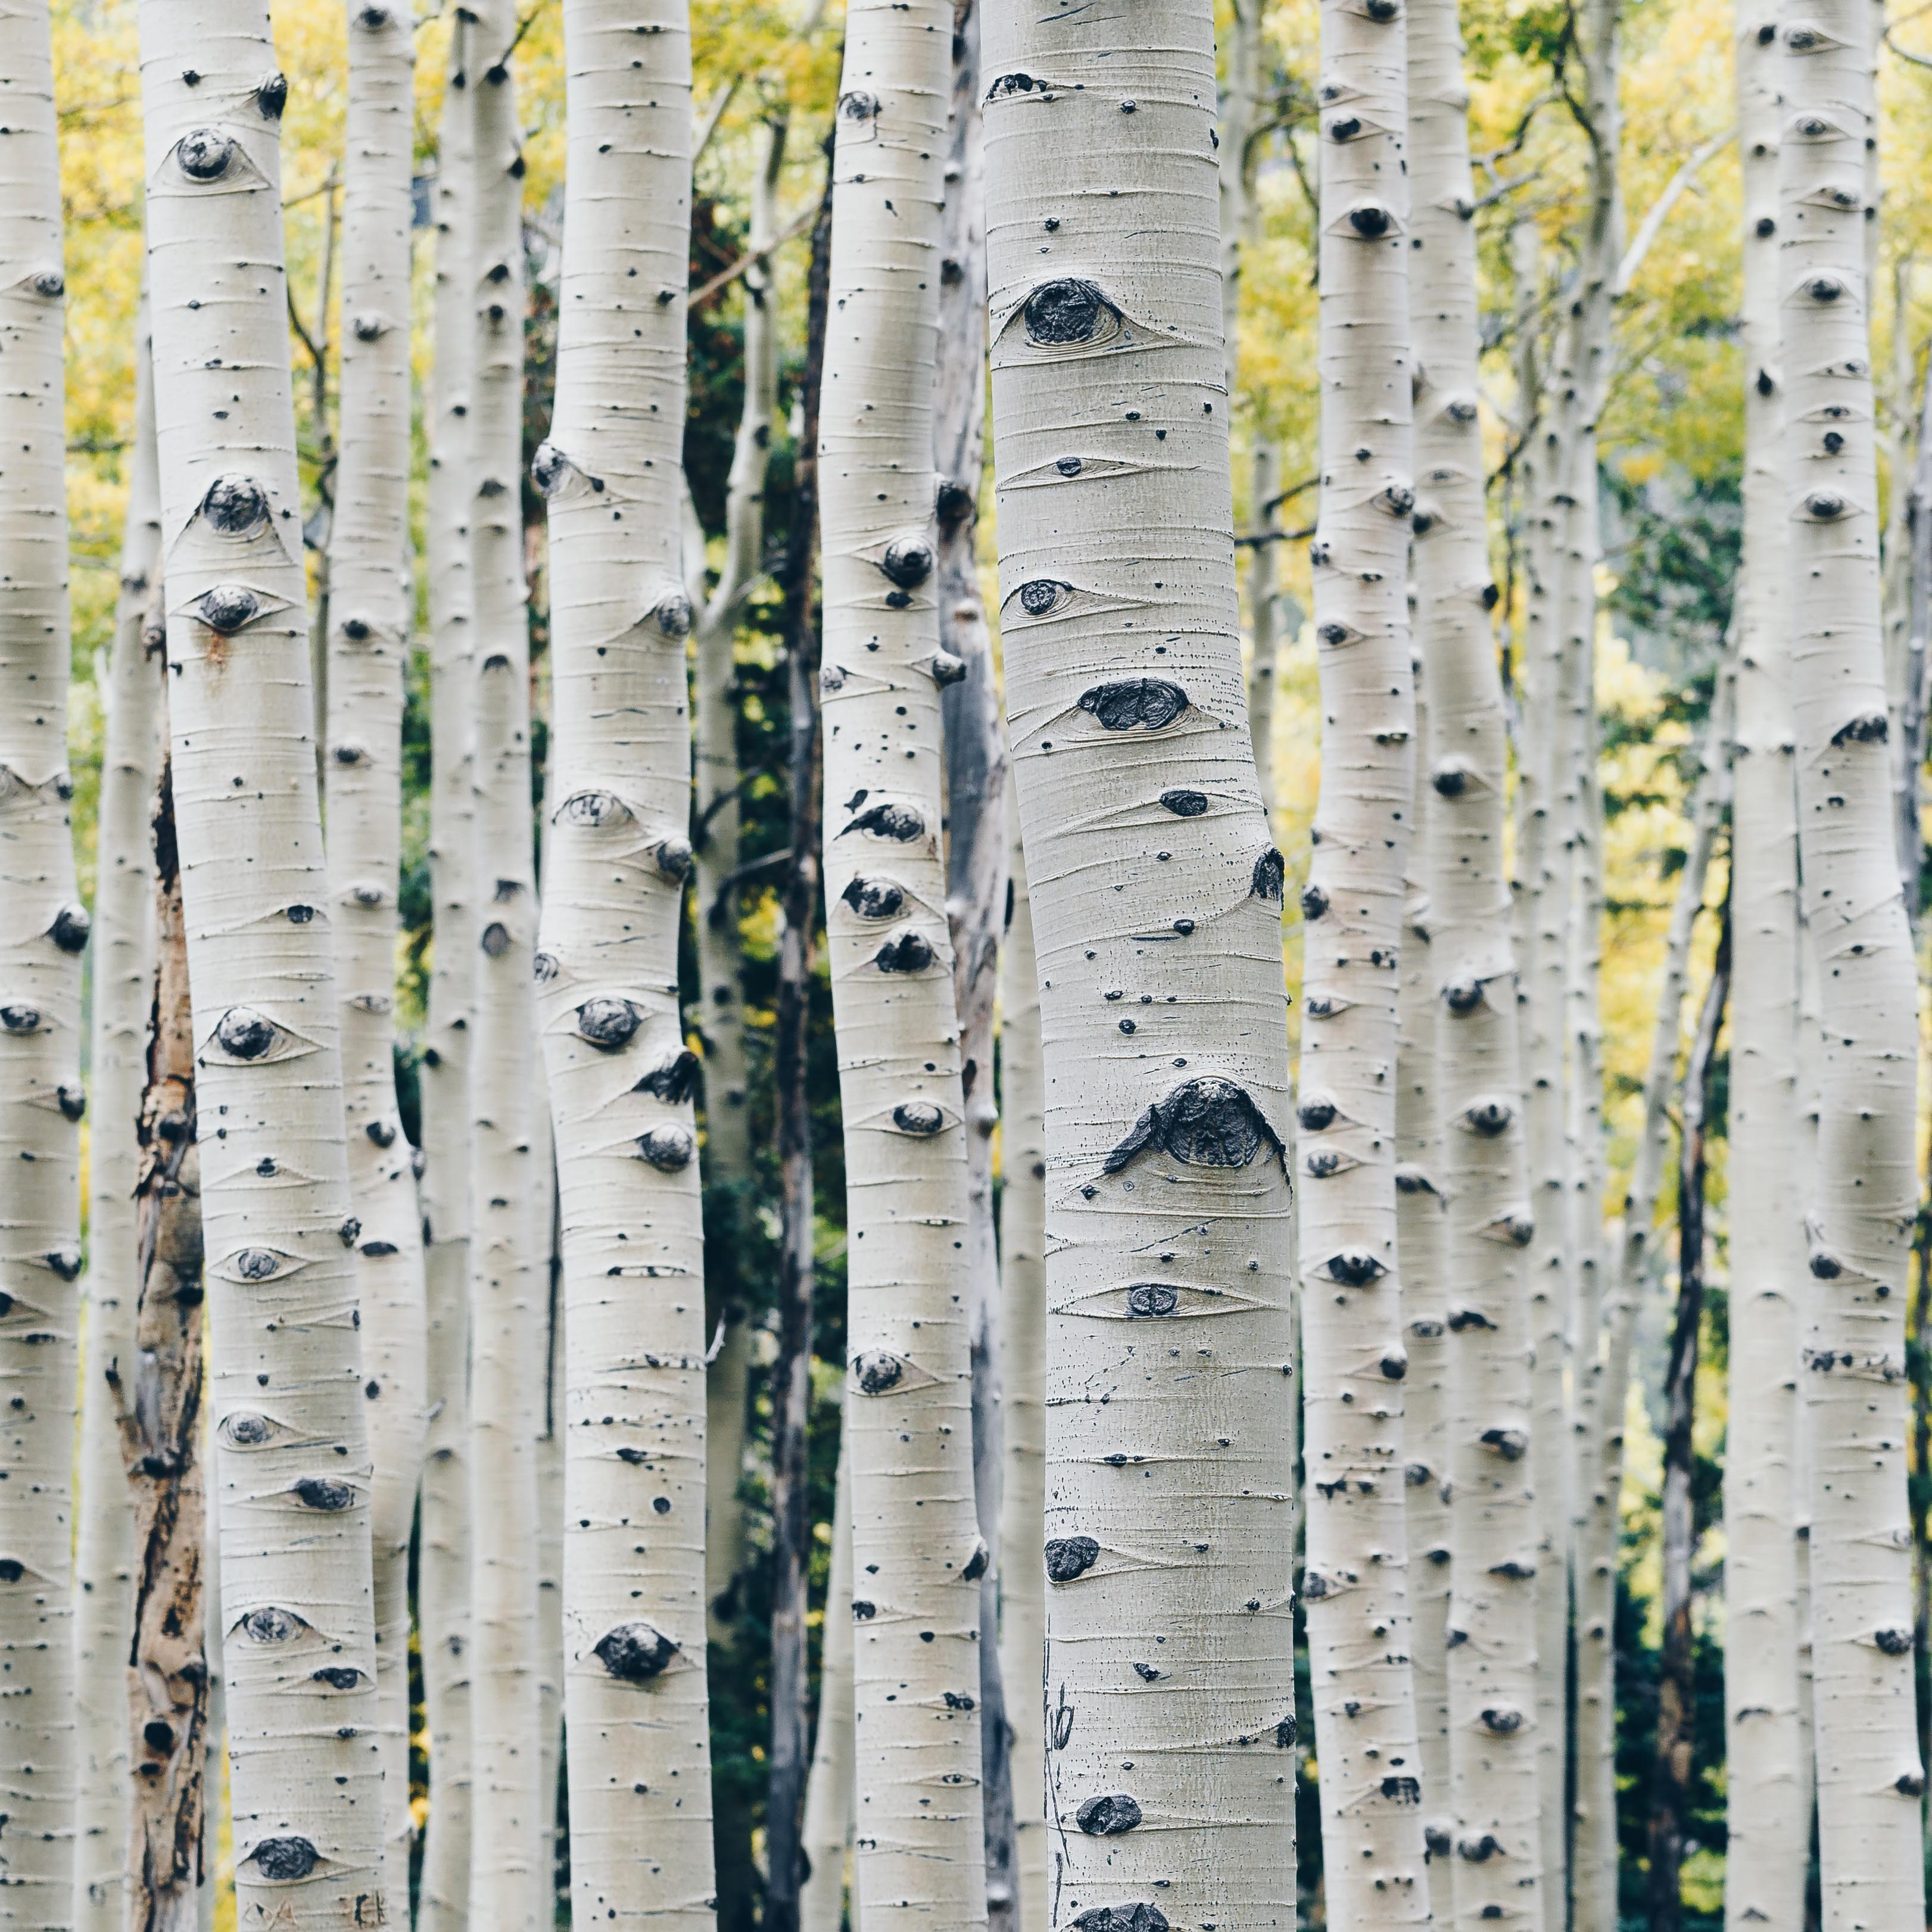 Bark of an Aspen Tree